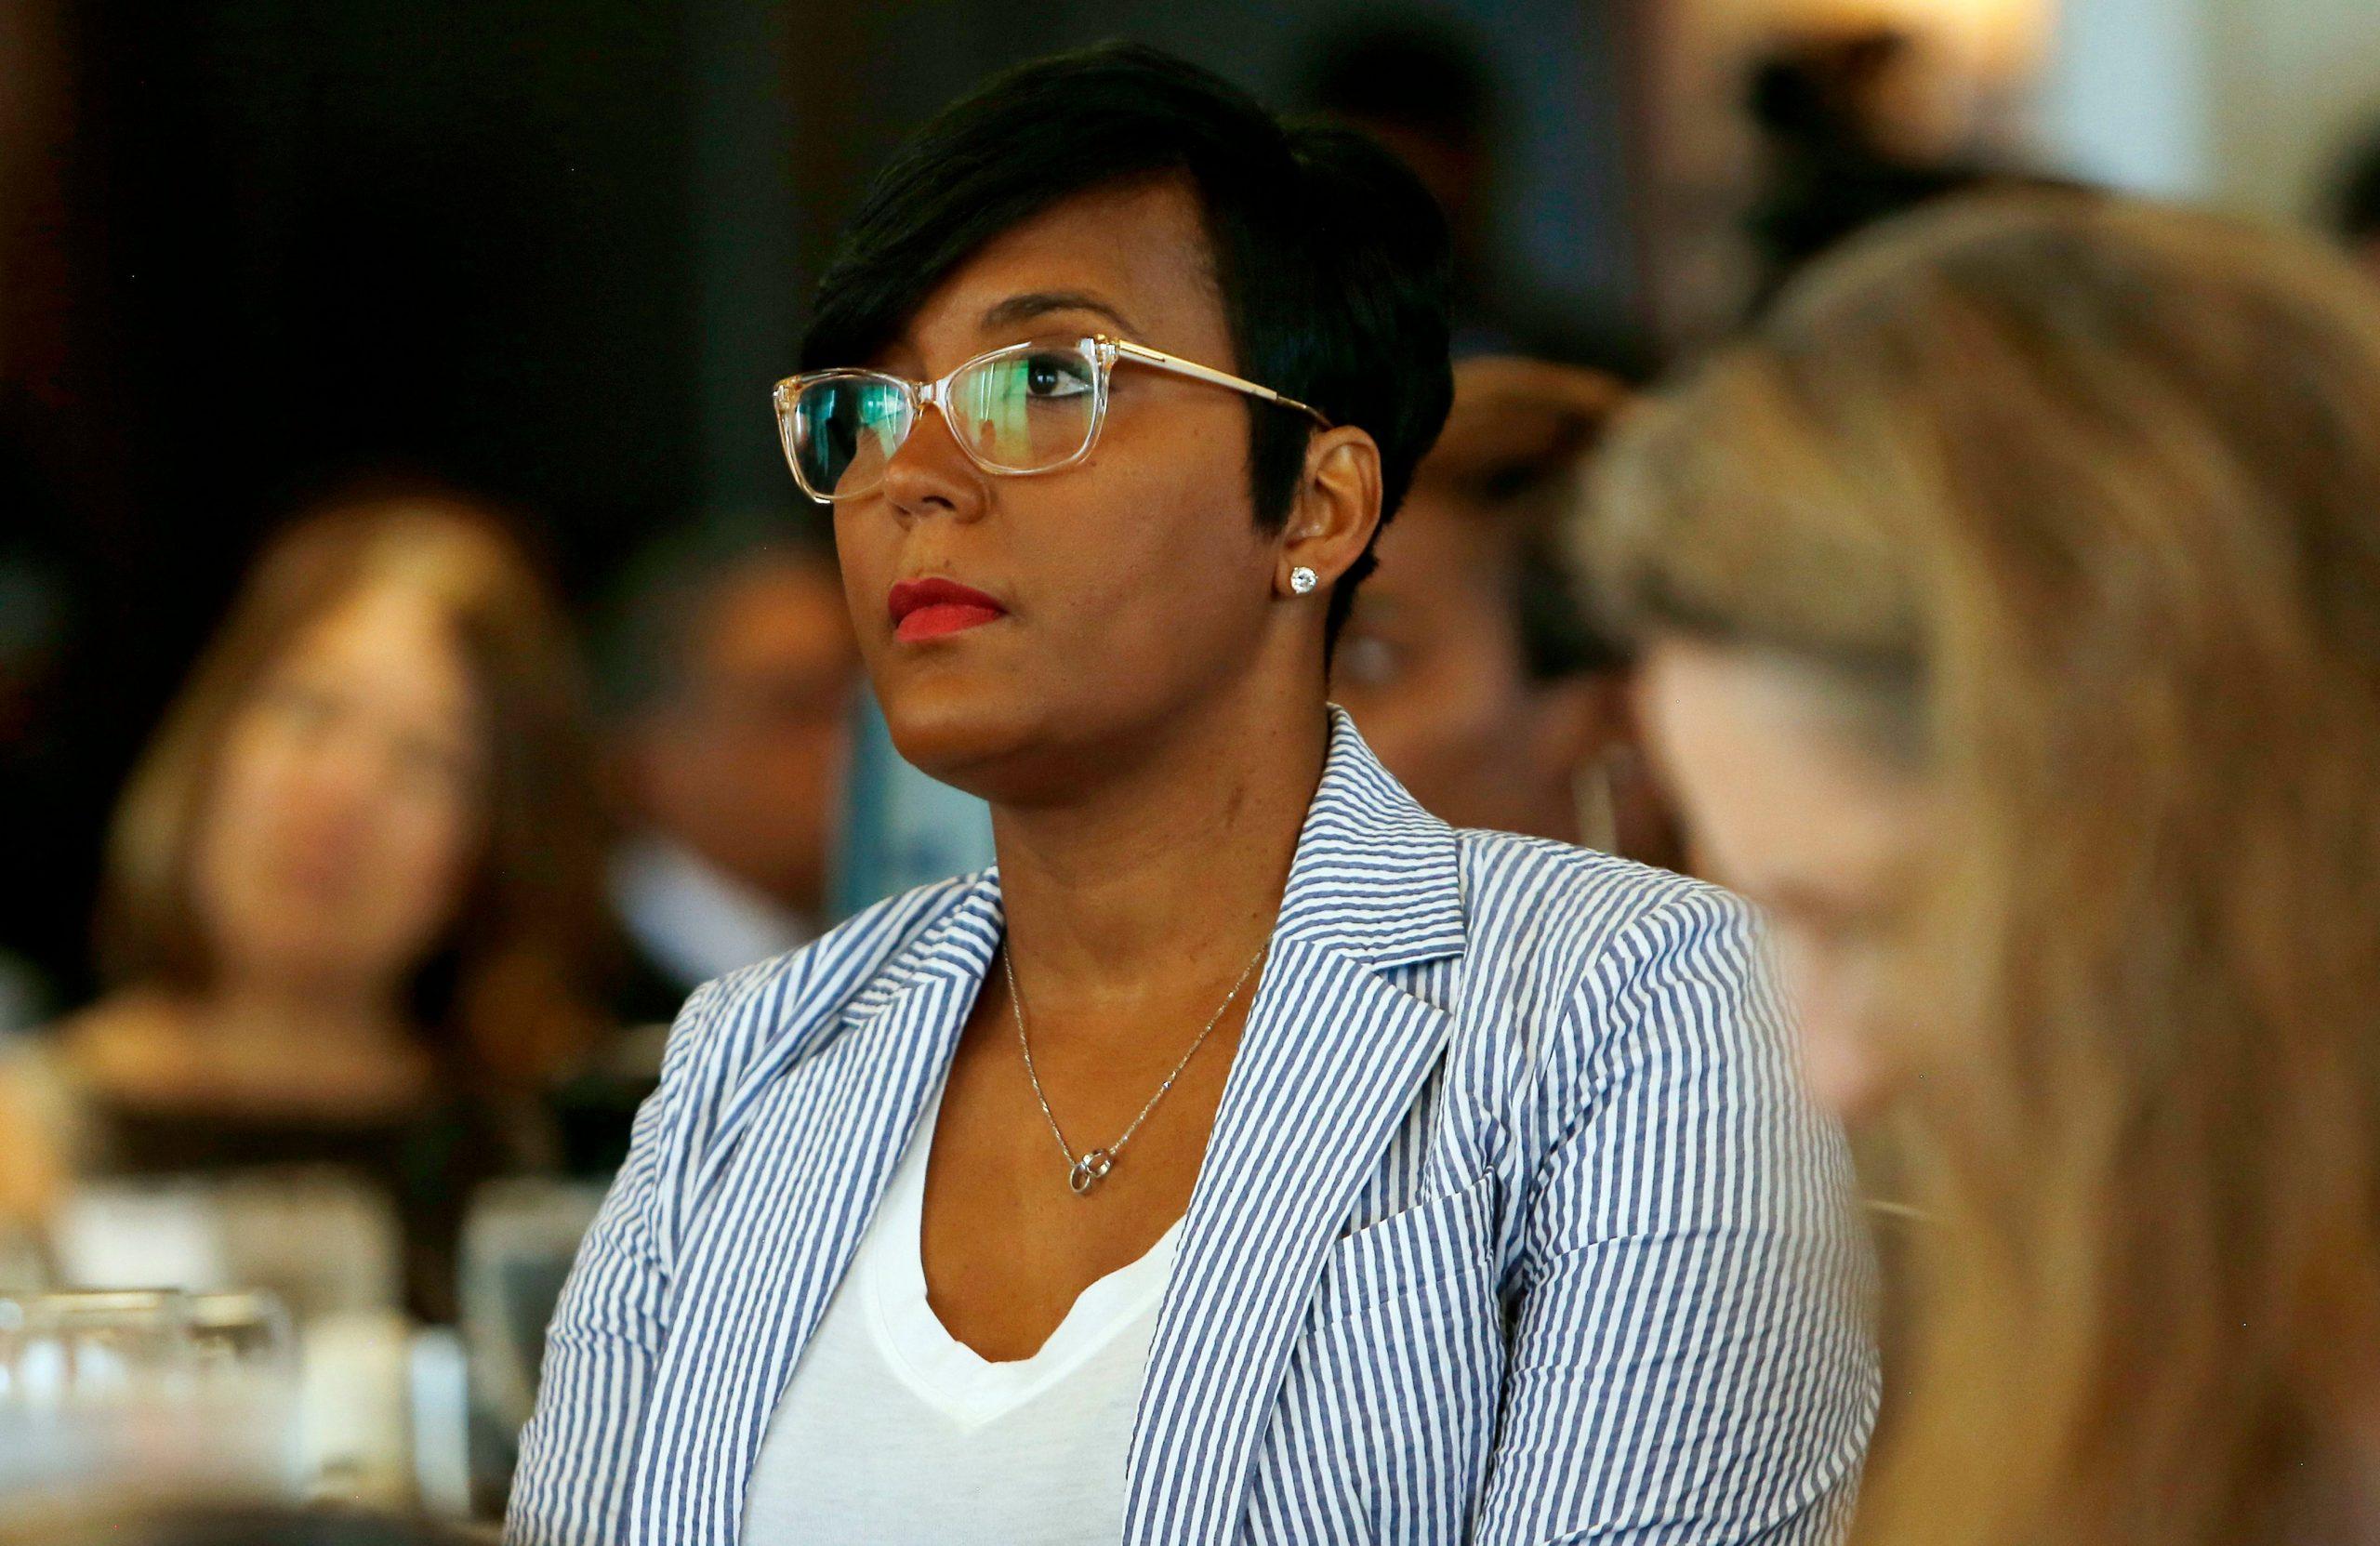 ATL Mayor Keisha Lance Bottoms Signs Mask Mandate Executive Order